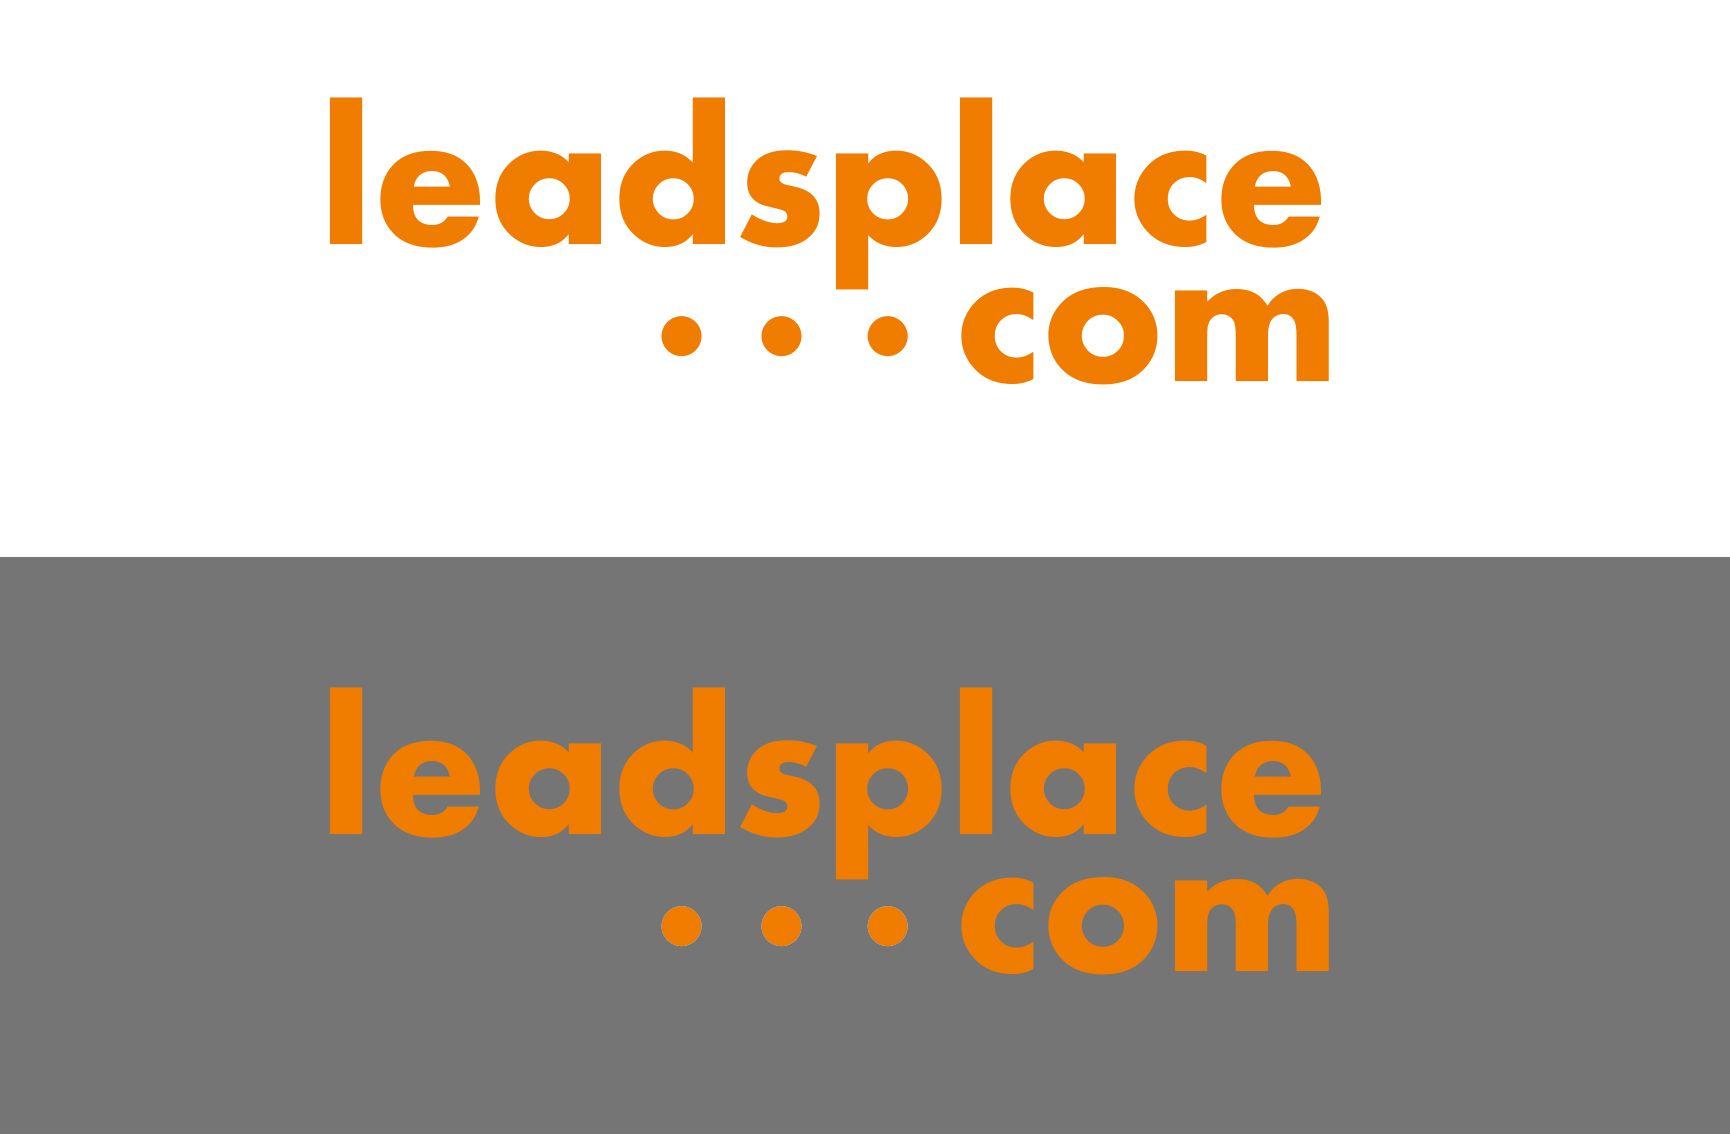 leadsplace.com - логотип - дизайнер AnnaKoroleva77